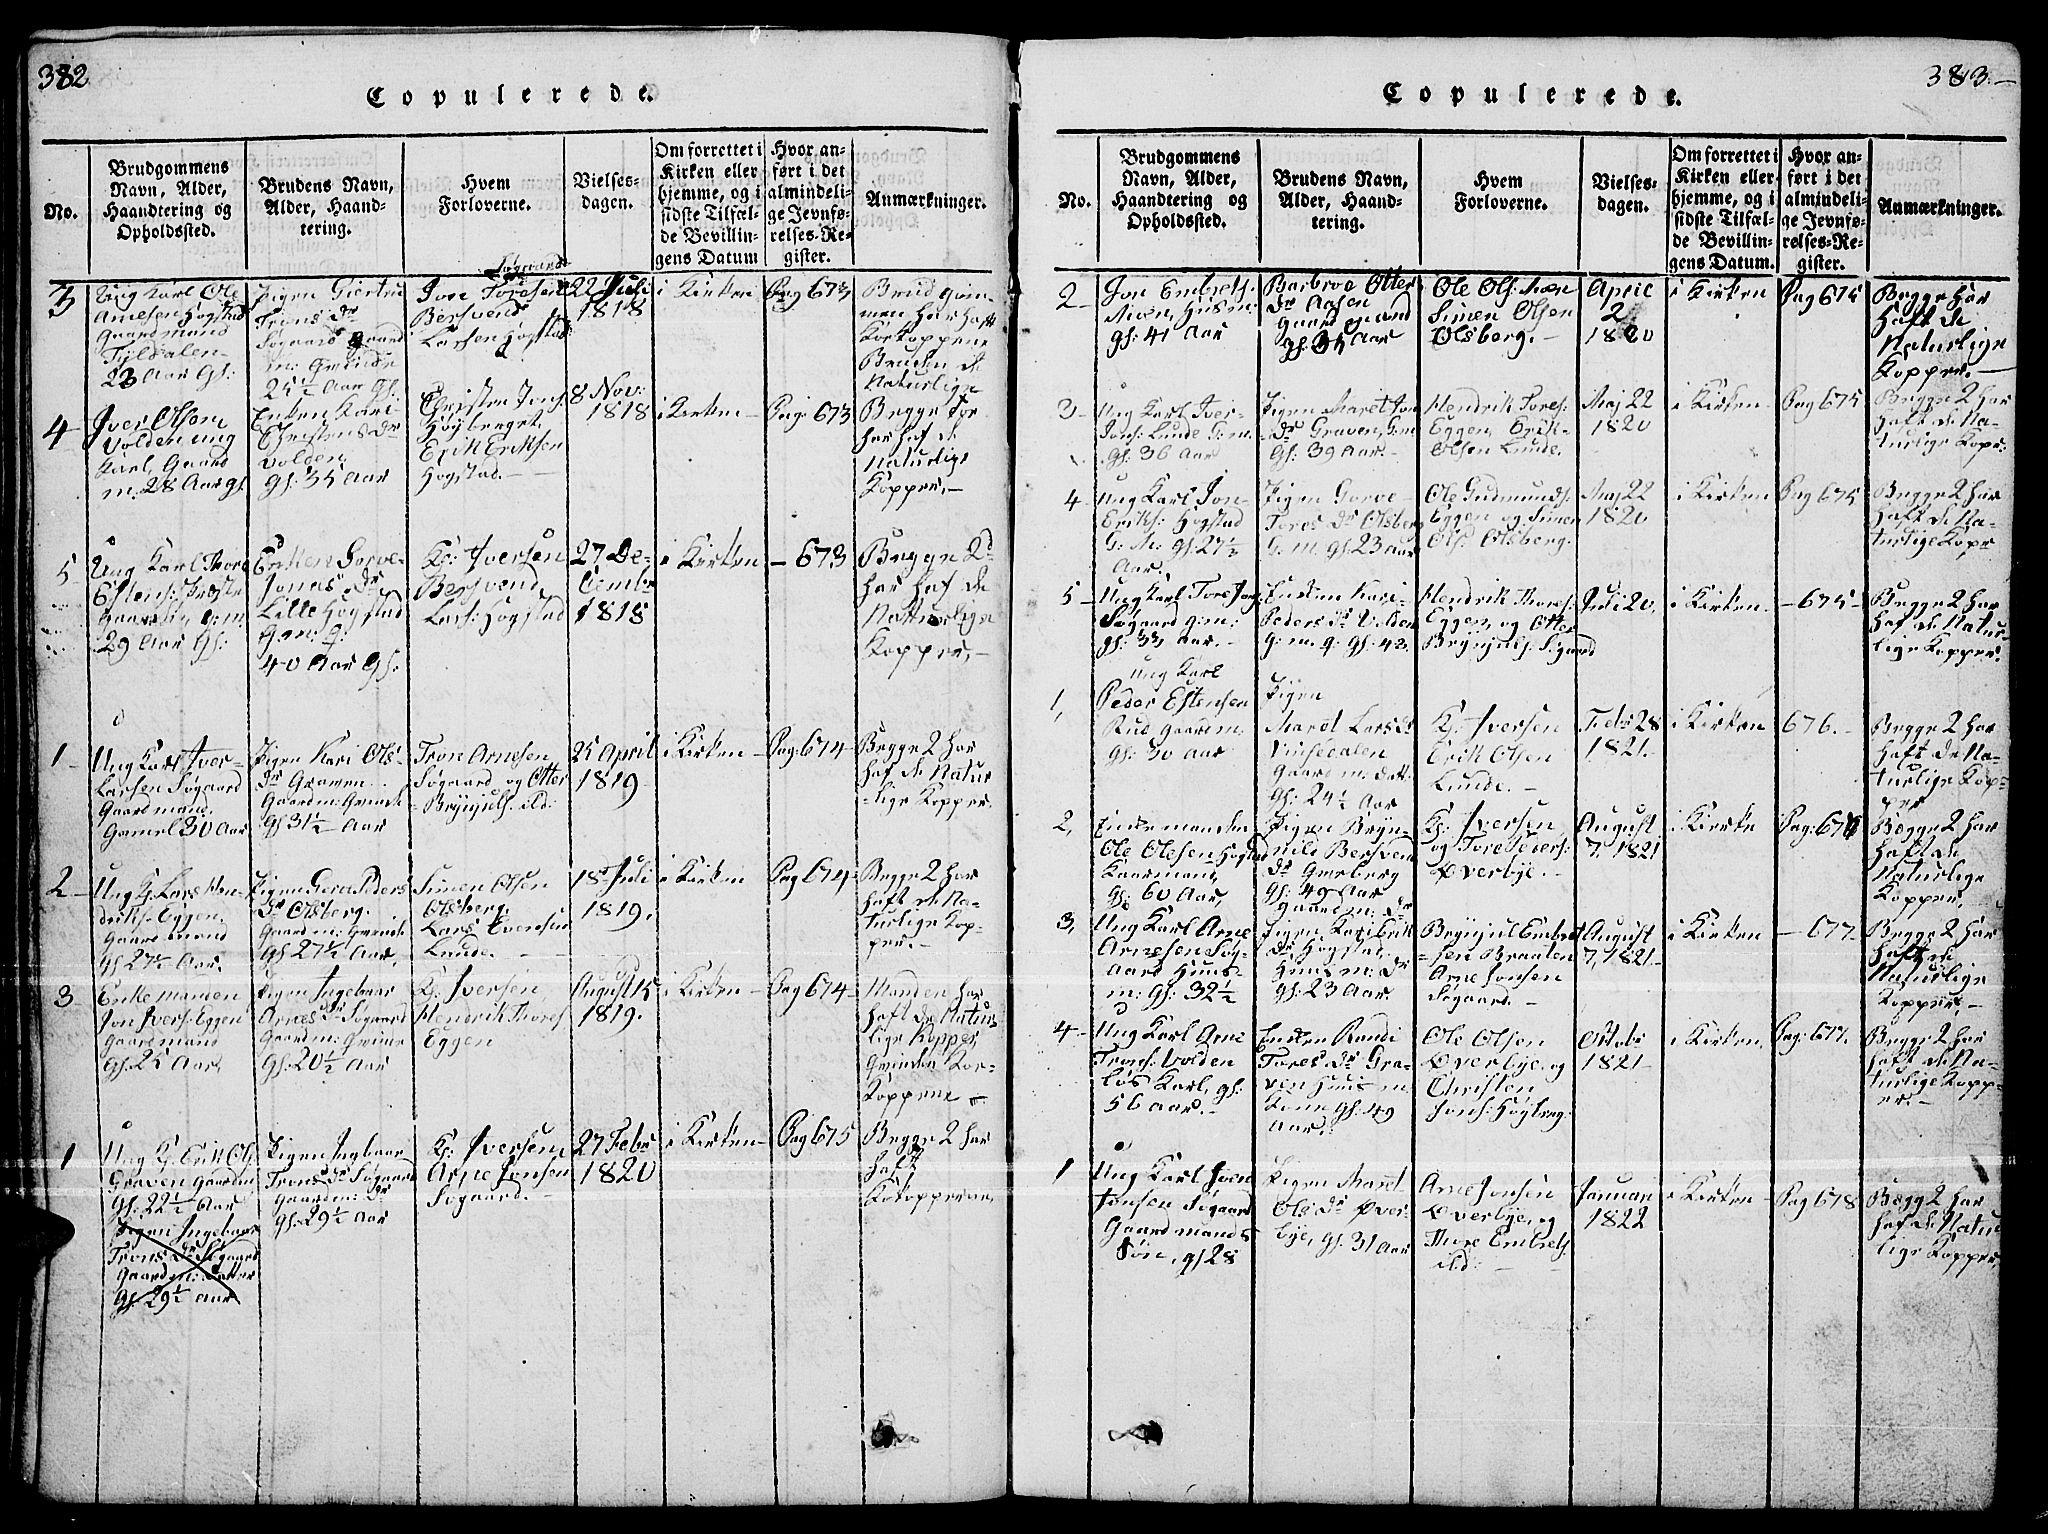 SAH, Tynset prestekontor, Klokkerbok nr. 4, 1814-1879, s. 382-383